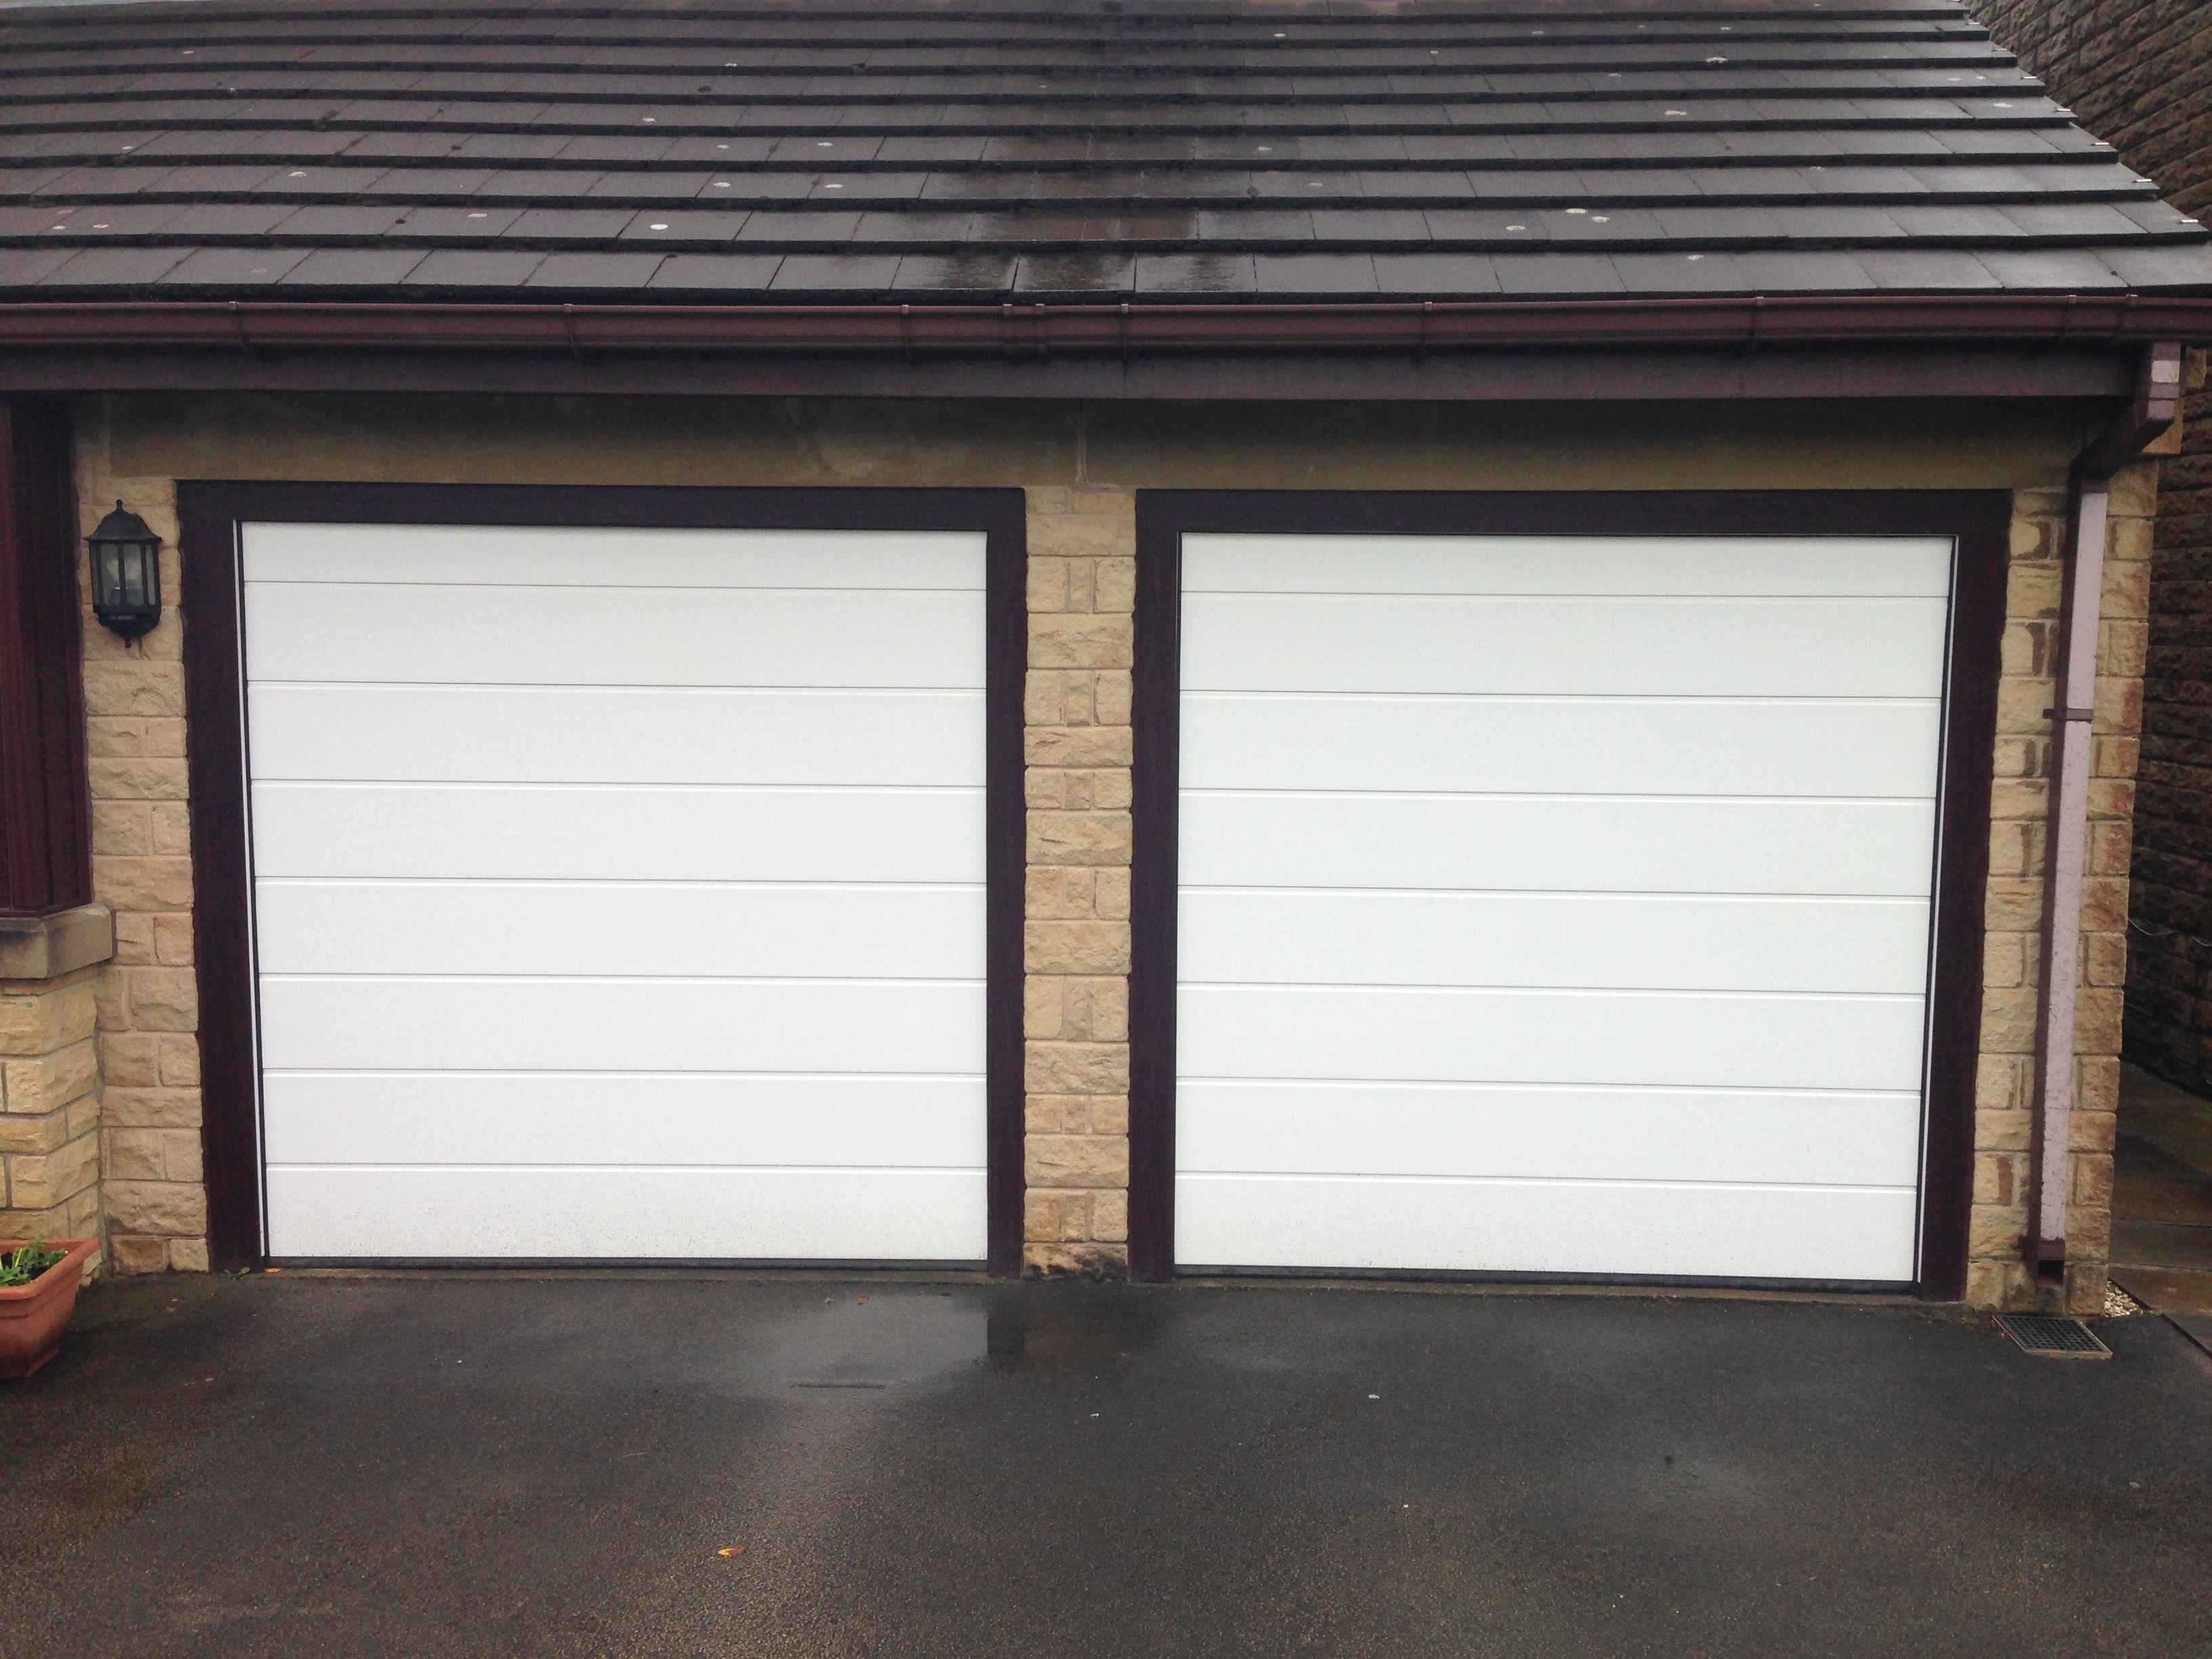 Case Study   Hormann LPU40 M Ribbed Design Sectional Garage Door Installed  In Leeds.